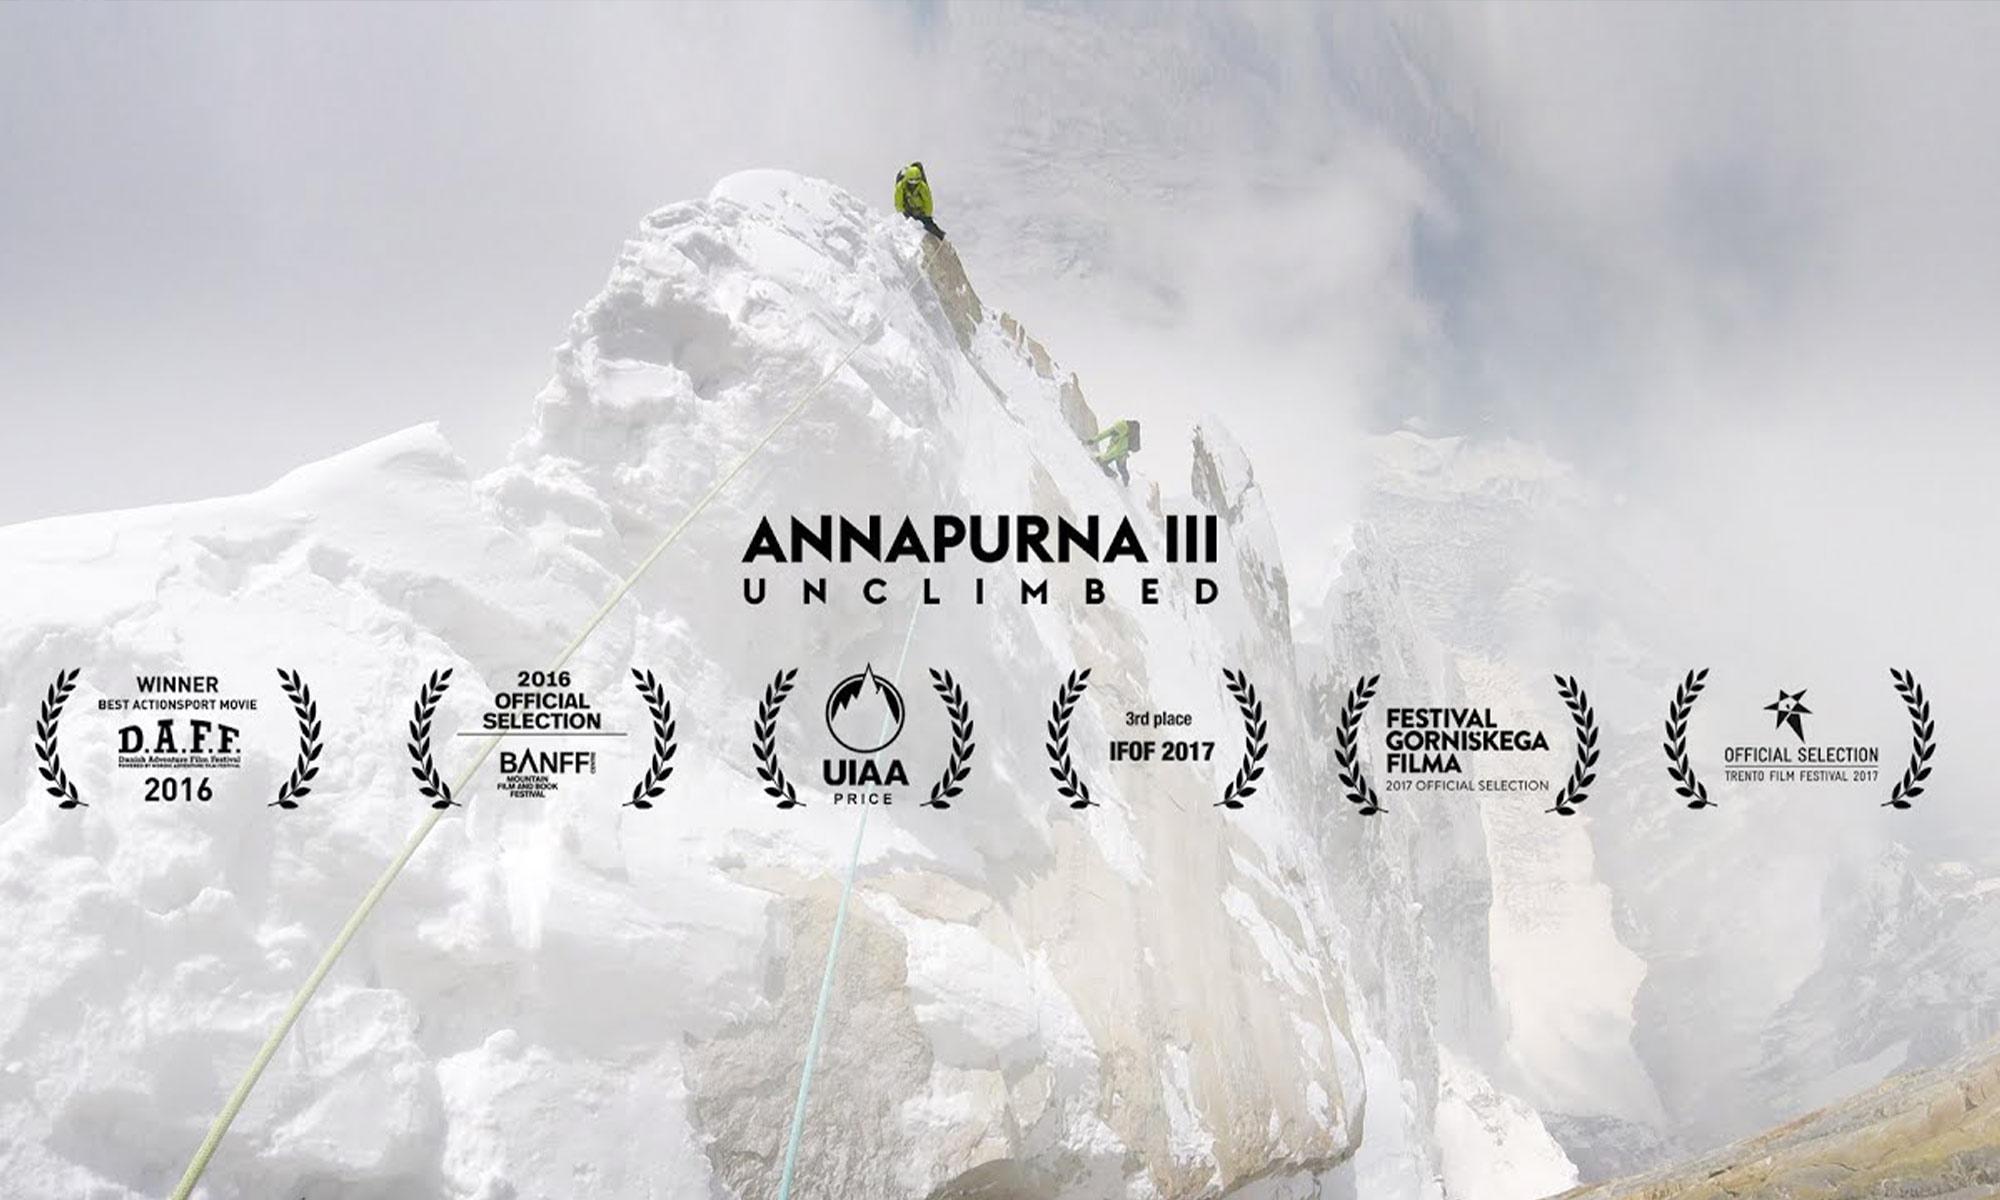 Annapurna III - Unclimbed